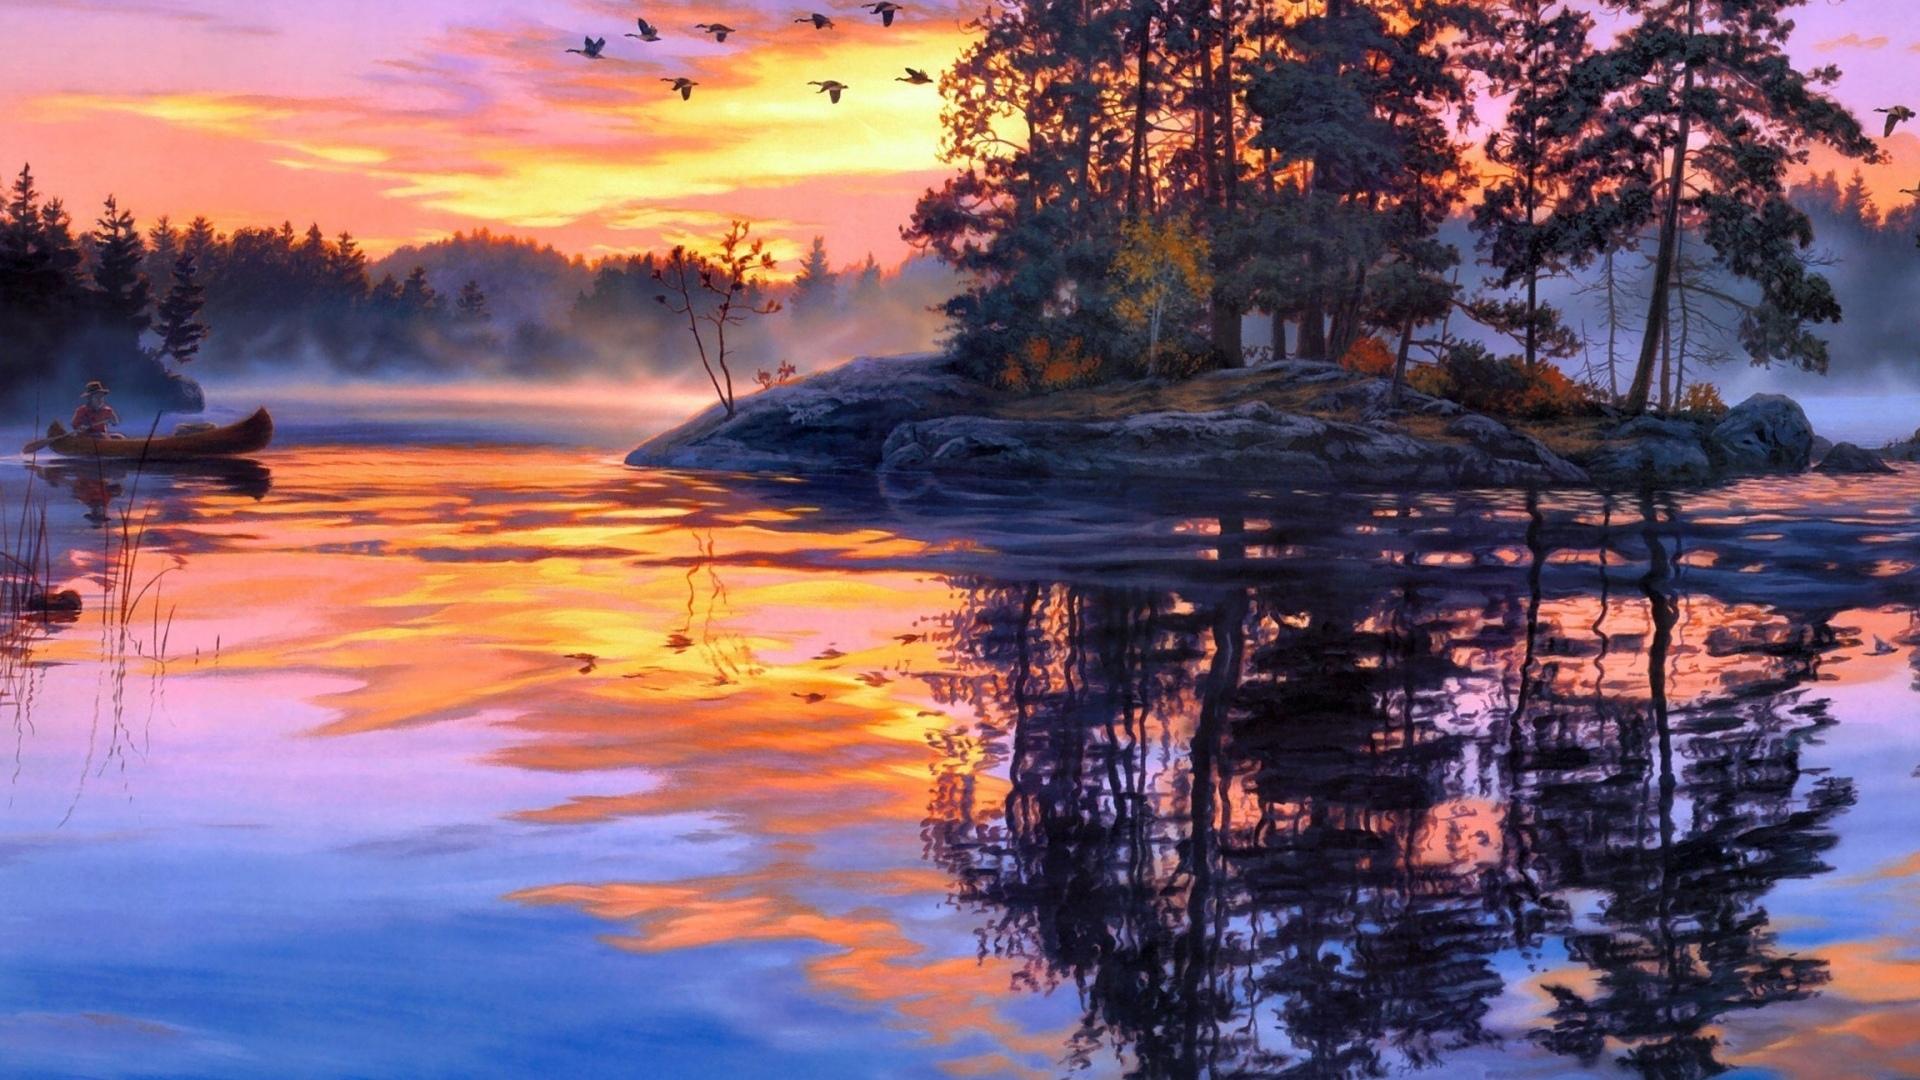 Balade_en_canoe_aux_aurores.jpg